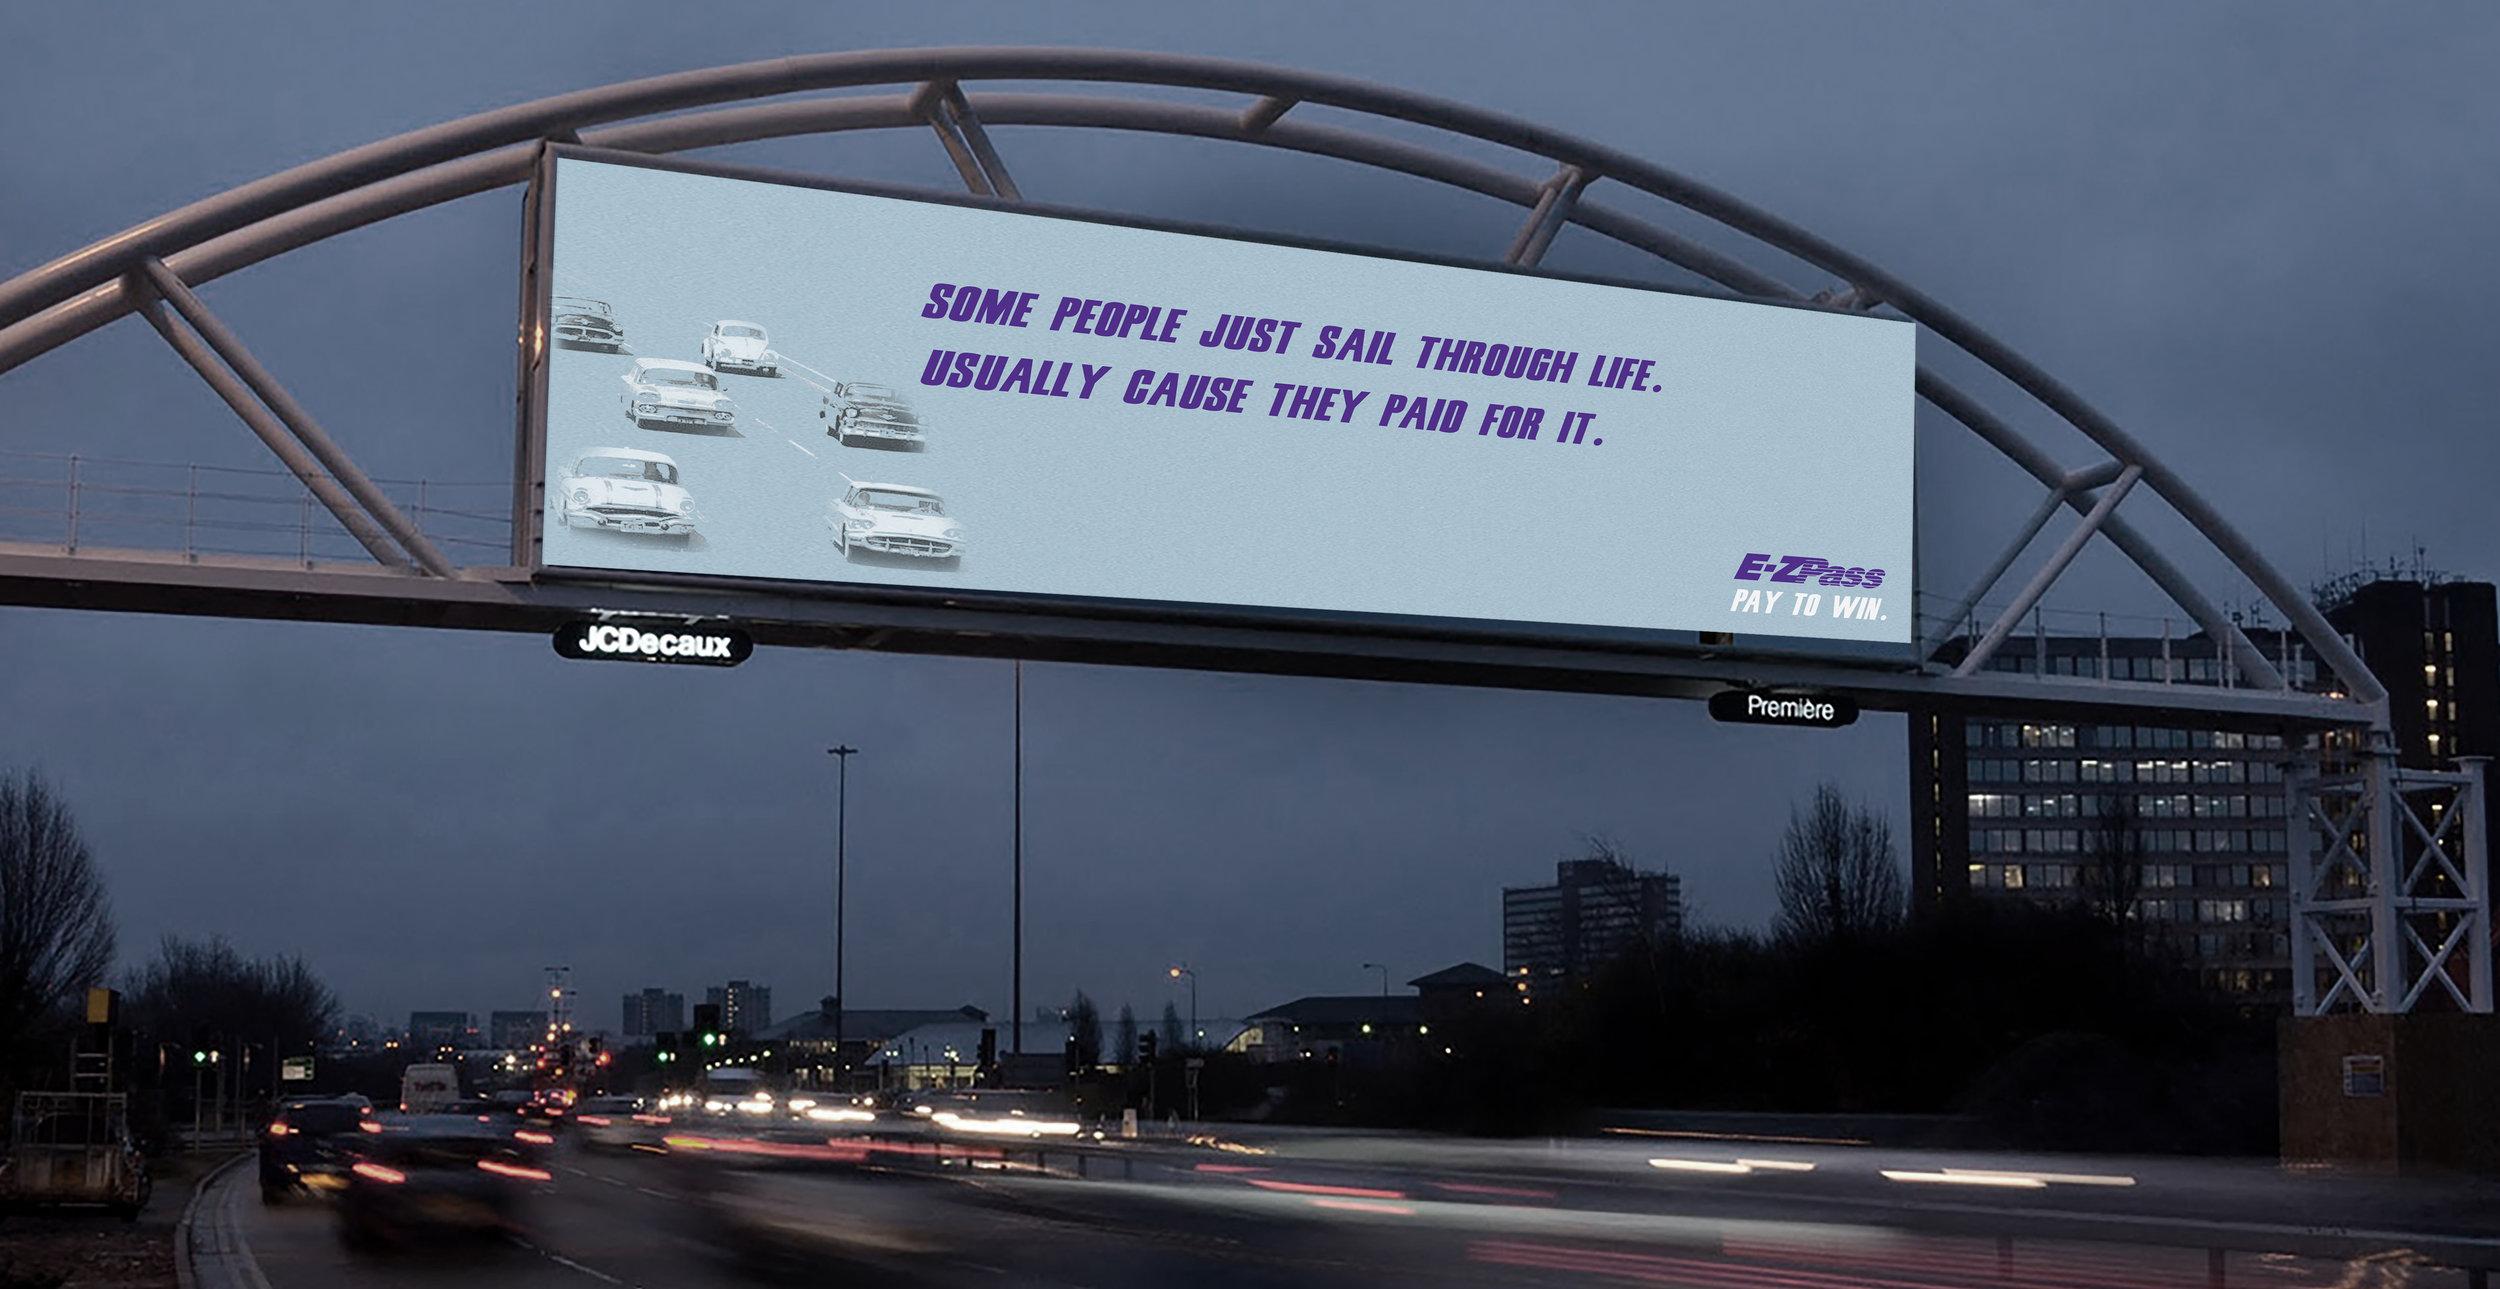 ezpass_billboard.jpg